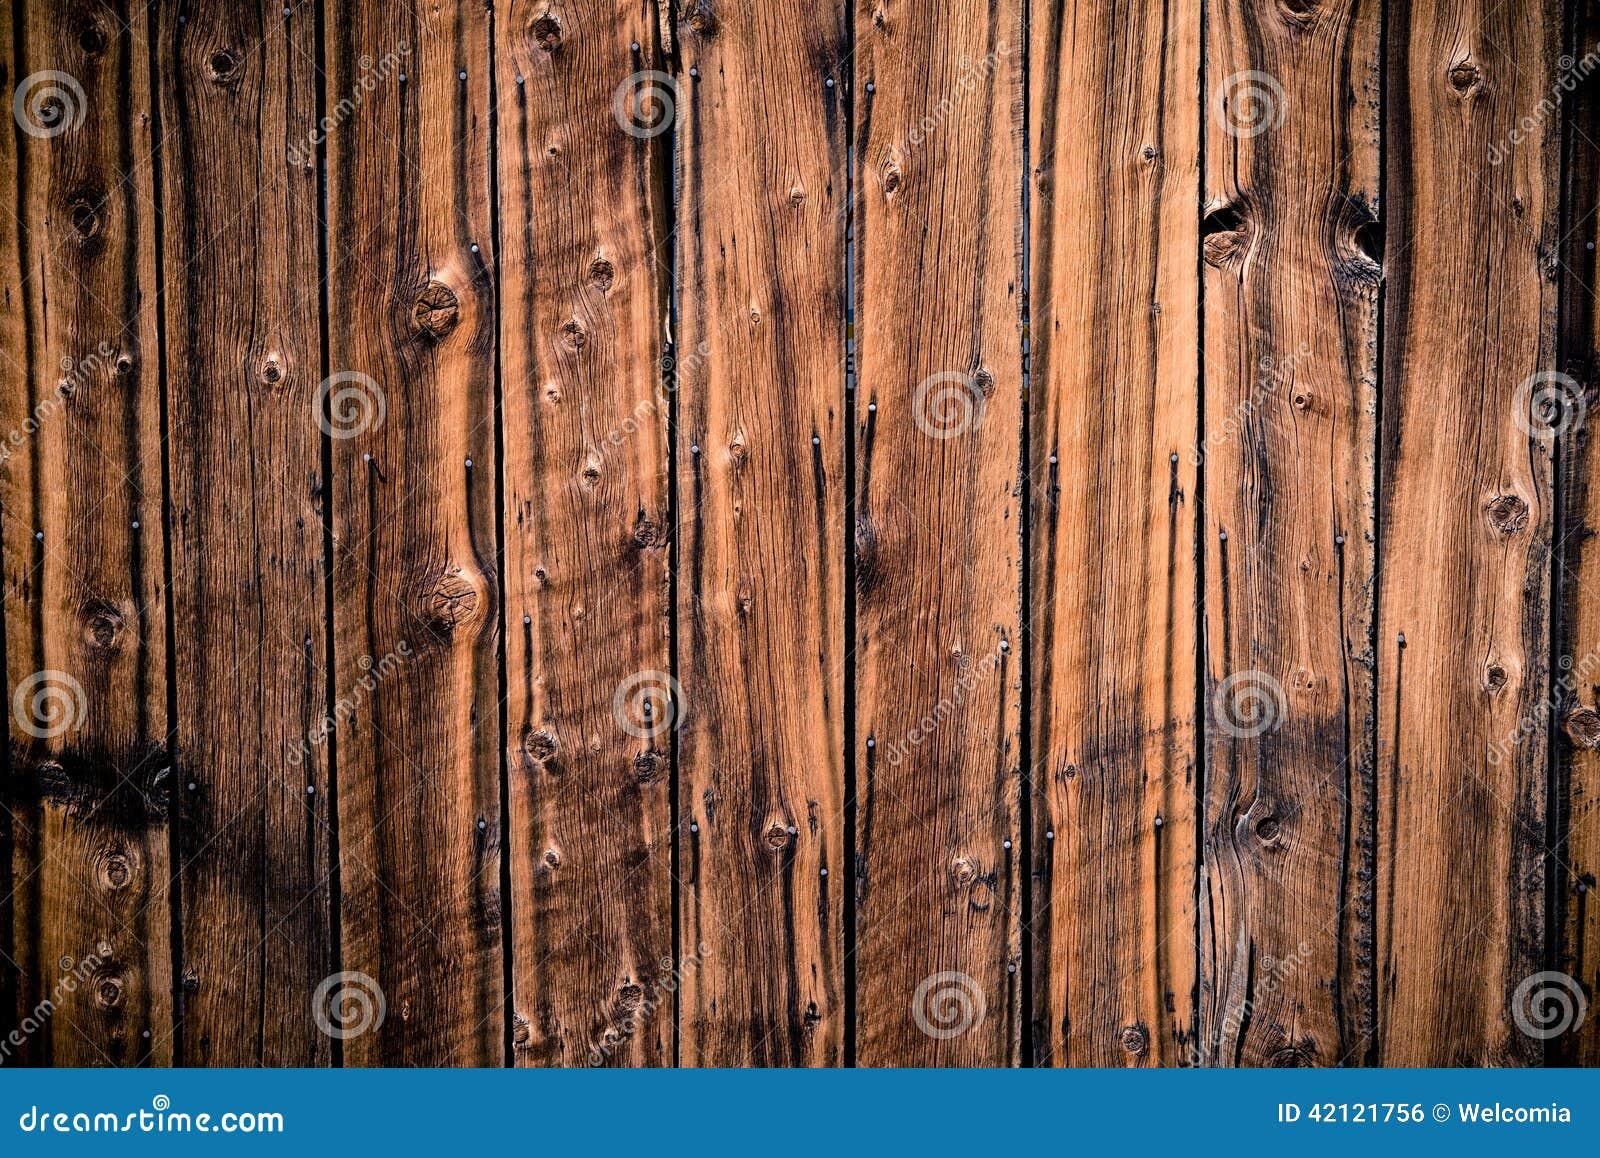 Aged vintage wood planks royalty free stock image